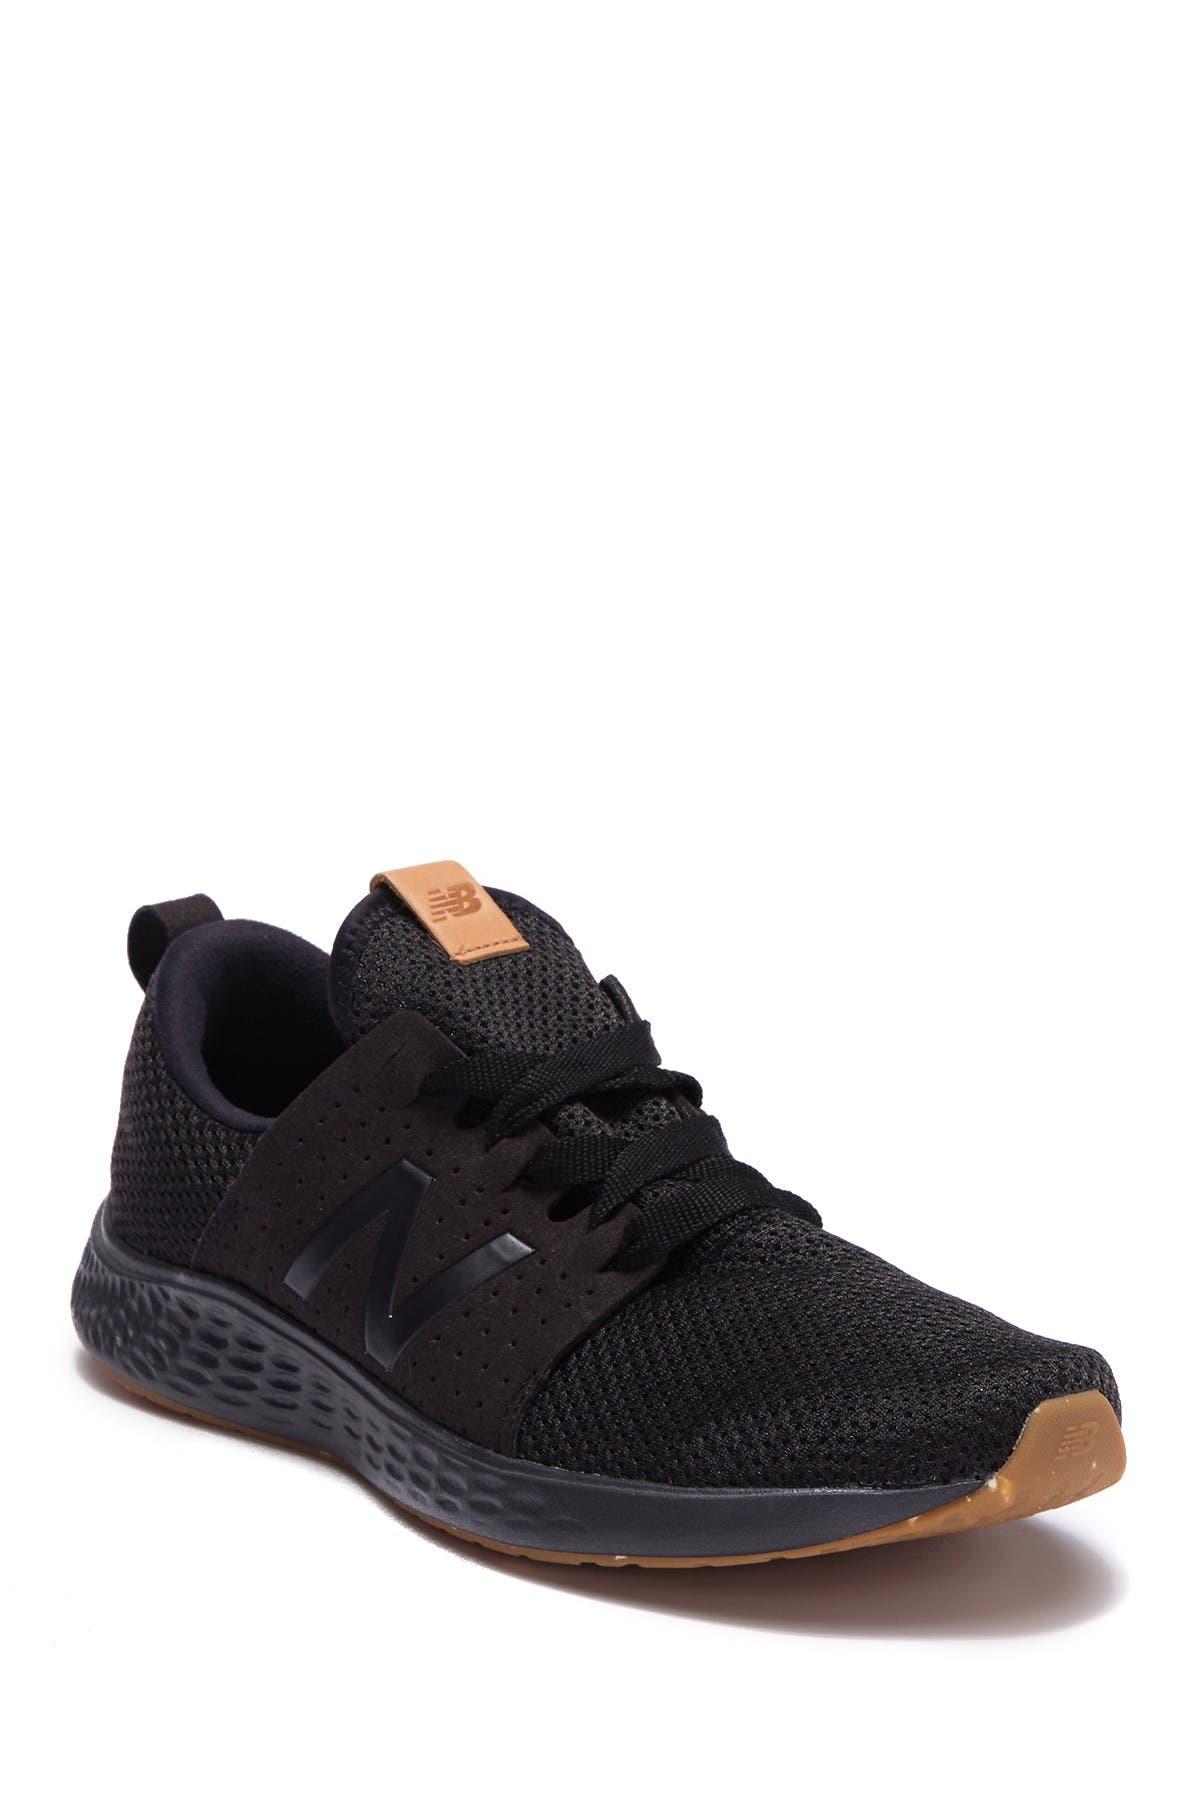 Image of New Balance Fresh Foam Running Sneaker